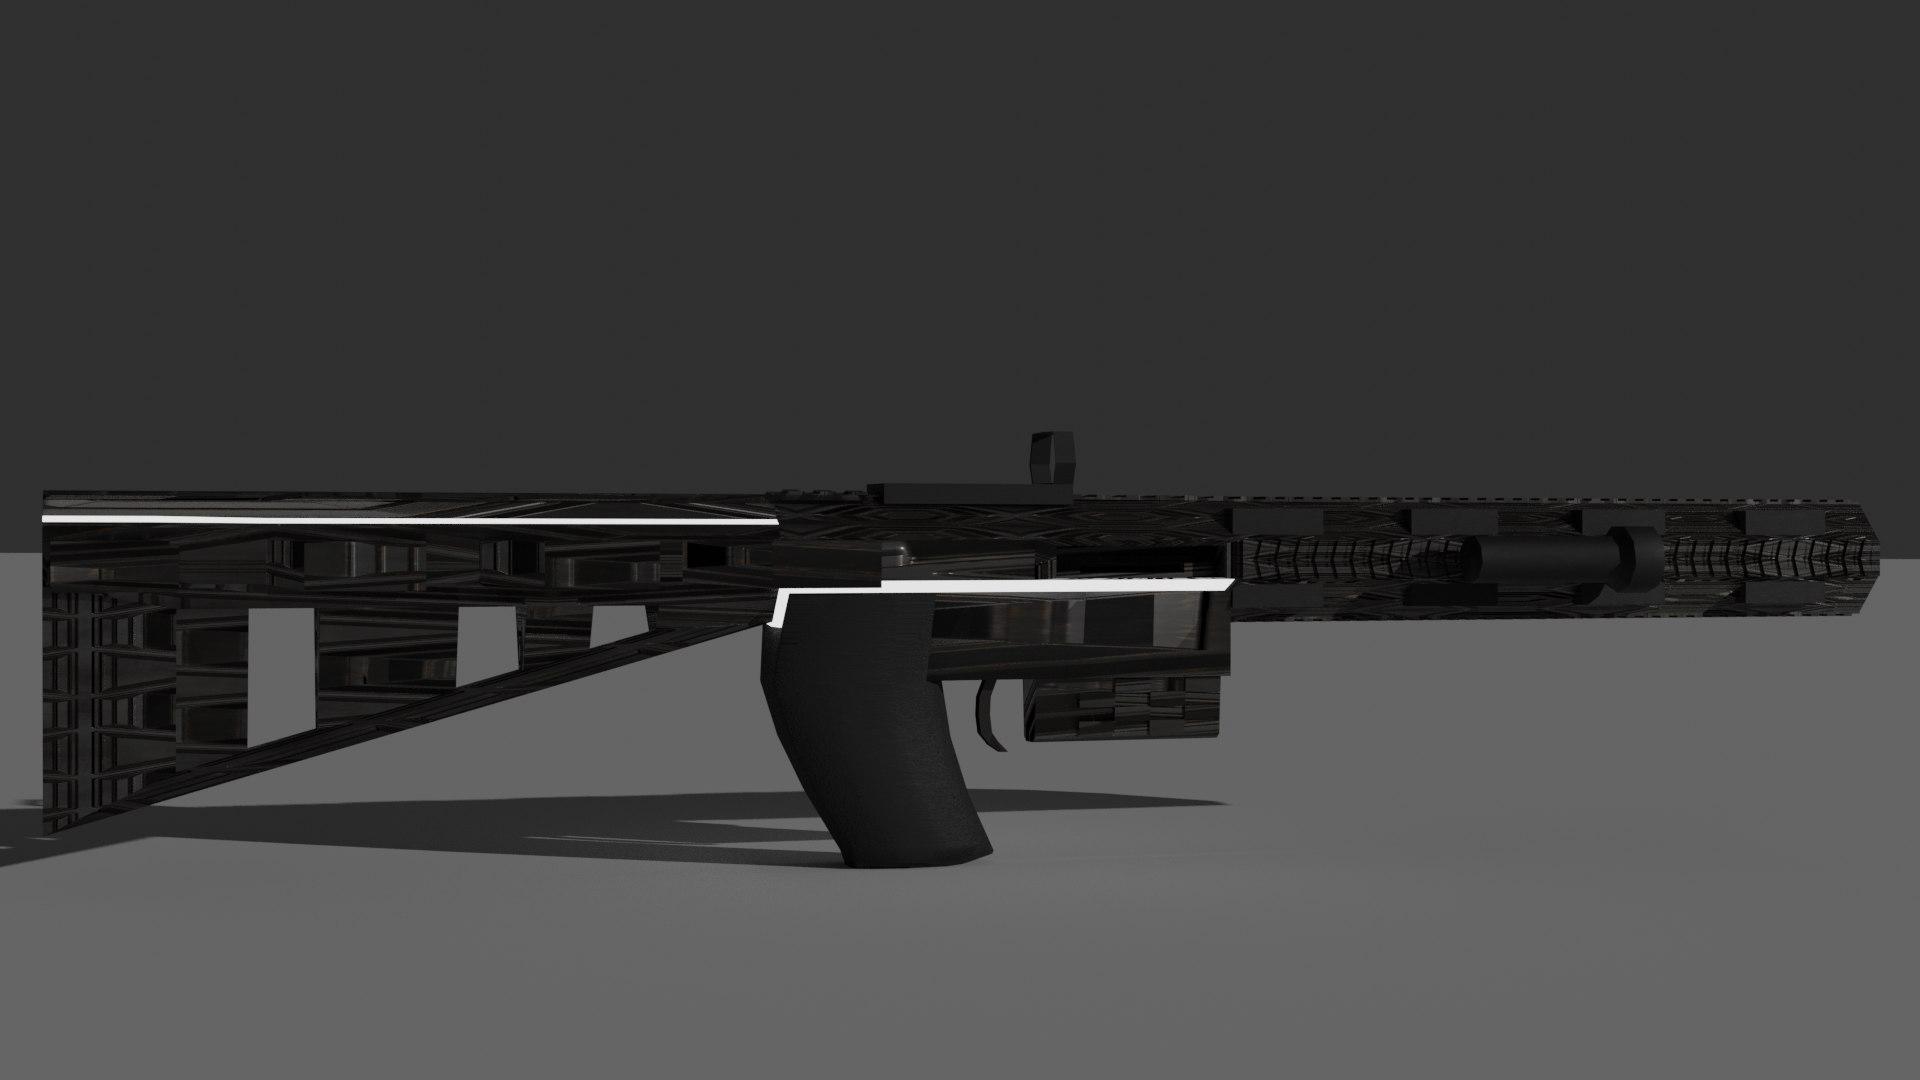 Blender gun games weapon 3D model - TurboSquid 1651532